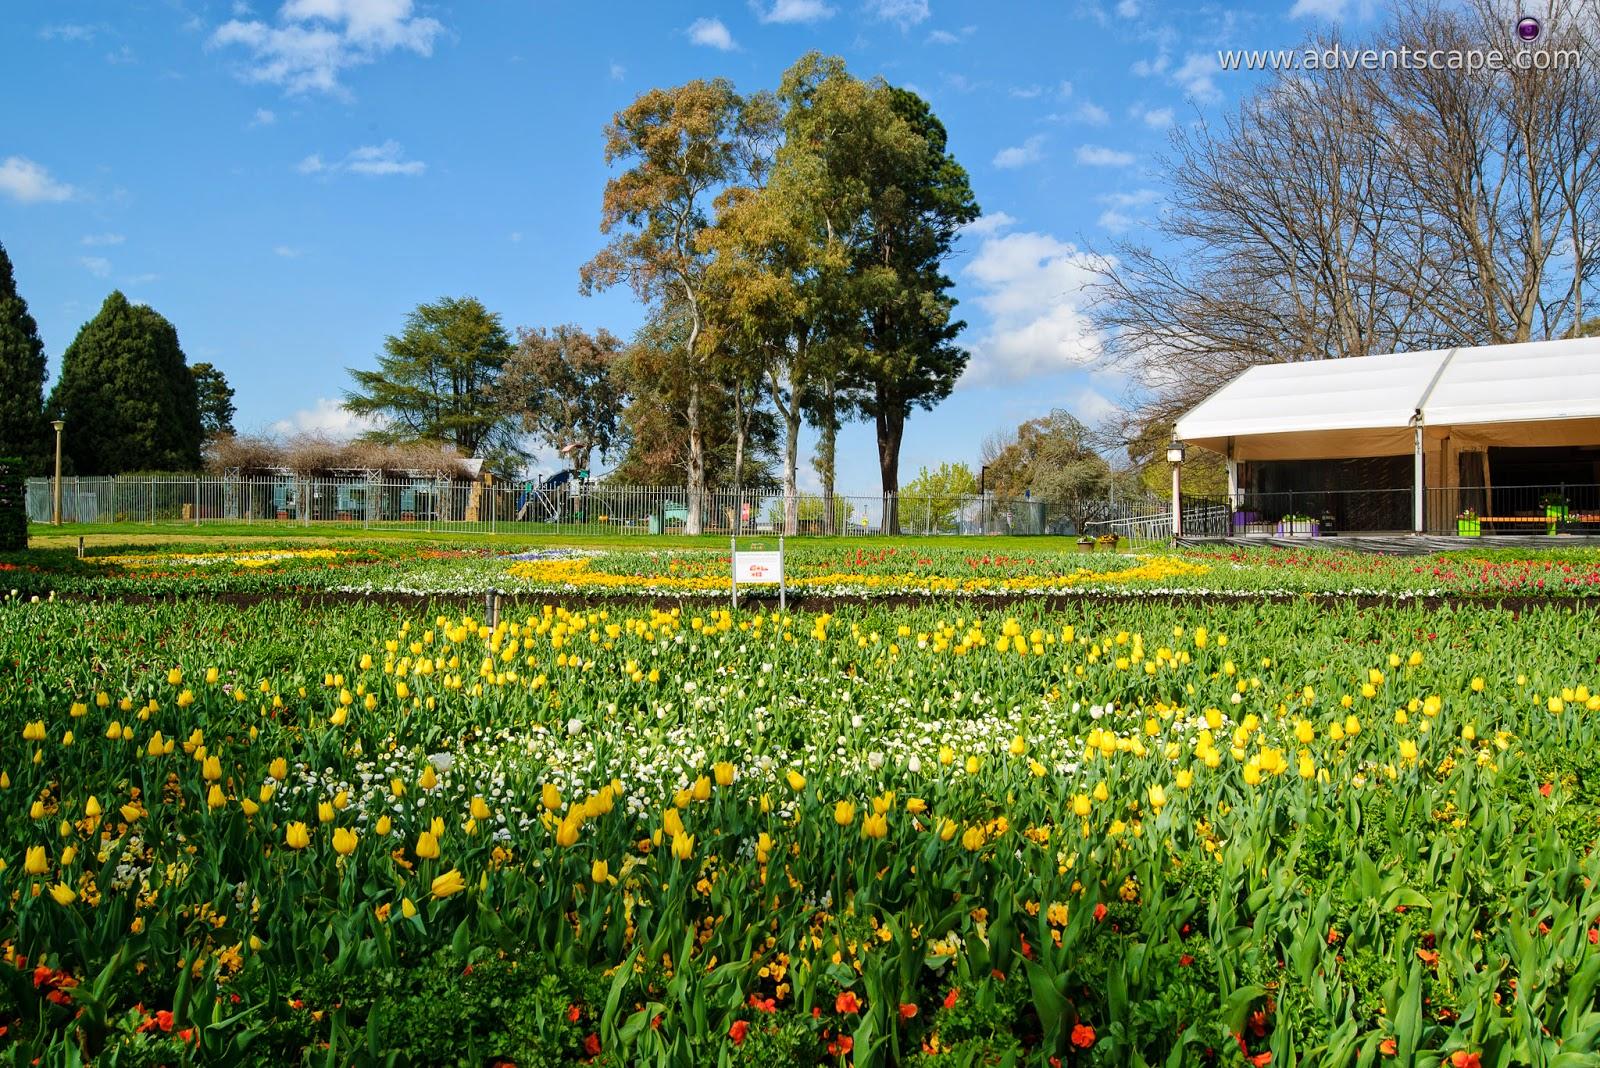 Philip Avellana, iori, advenscape, Floriade, 2014, spring festival, Canberra, ACT, Australian Capital Territory, park, flowers, blossom